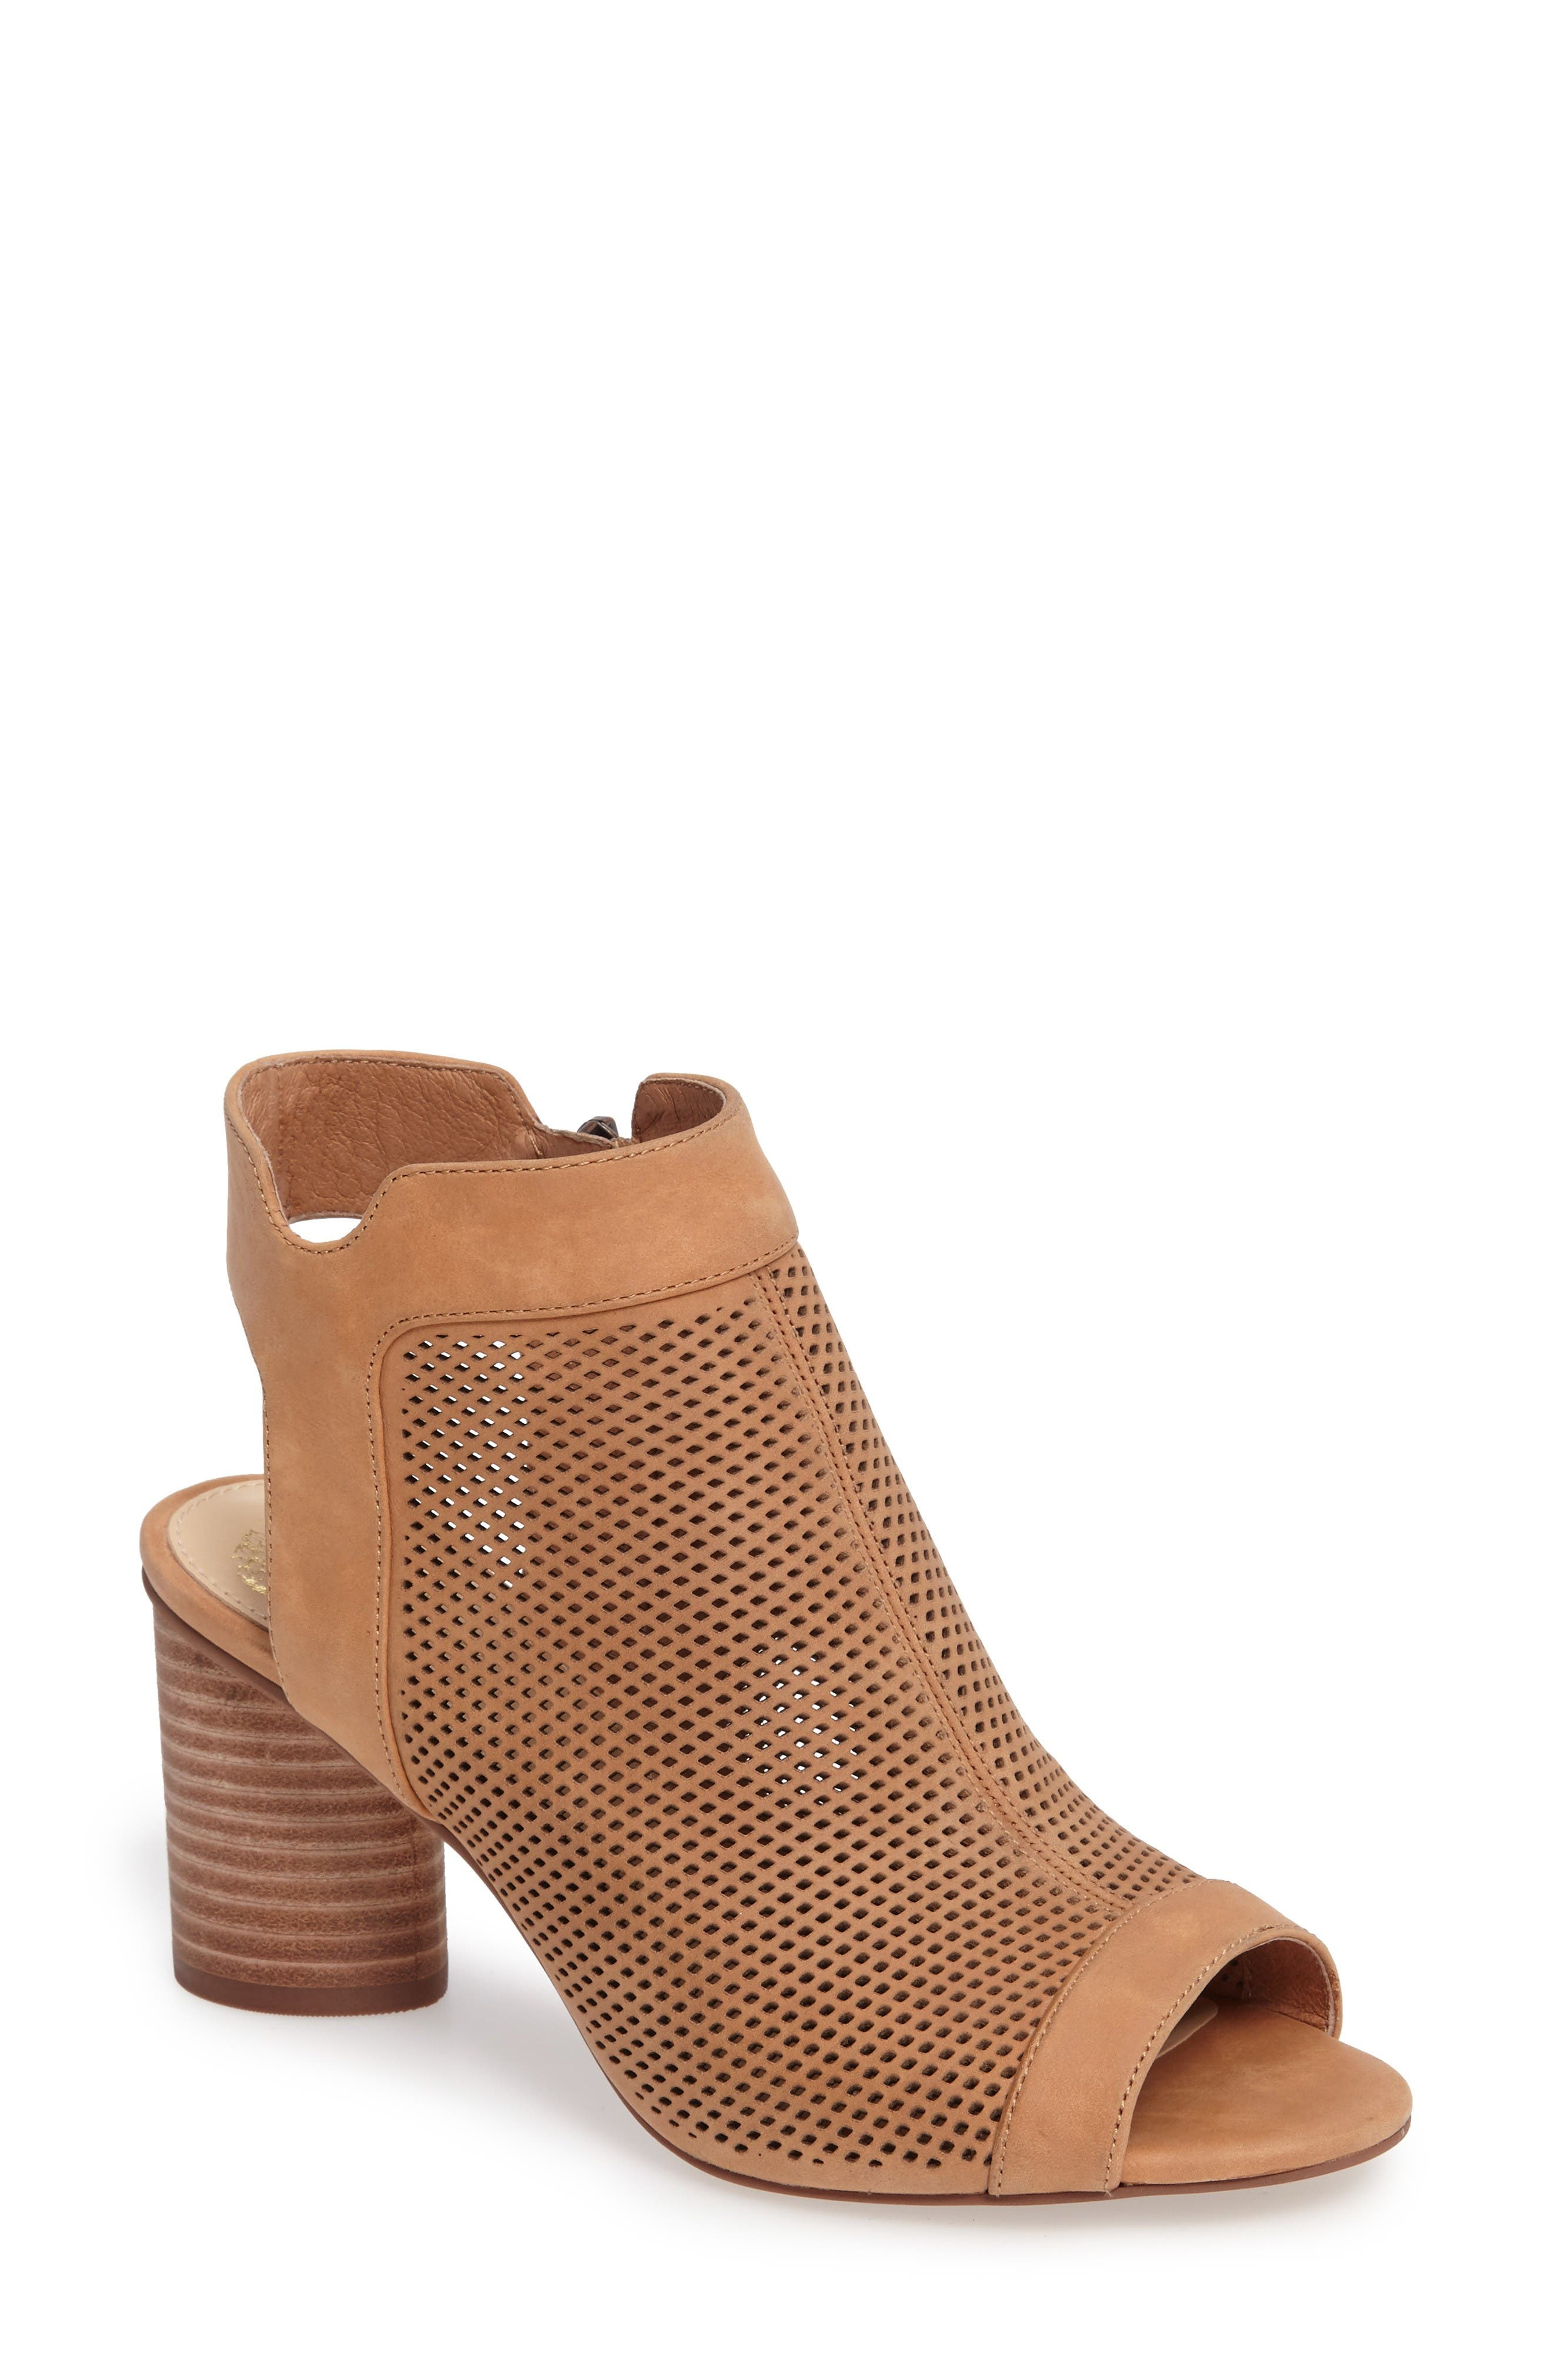 Jakayla Sandal,                         Main,                         color, Peanut Leather